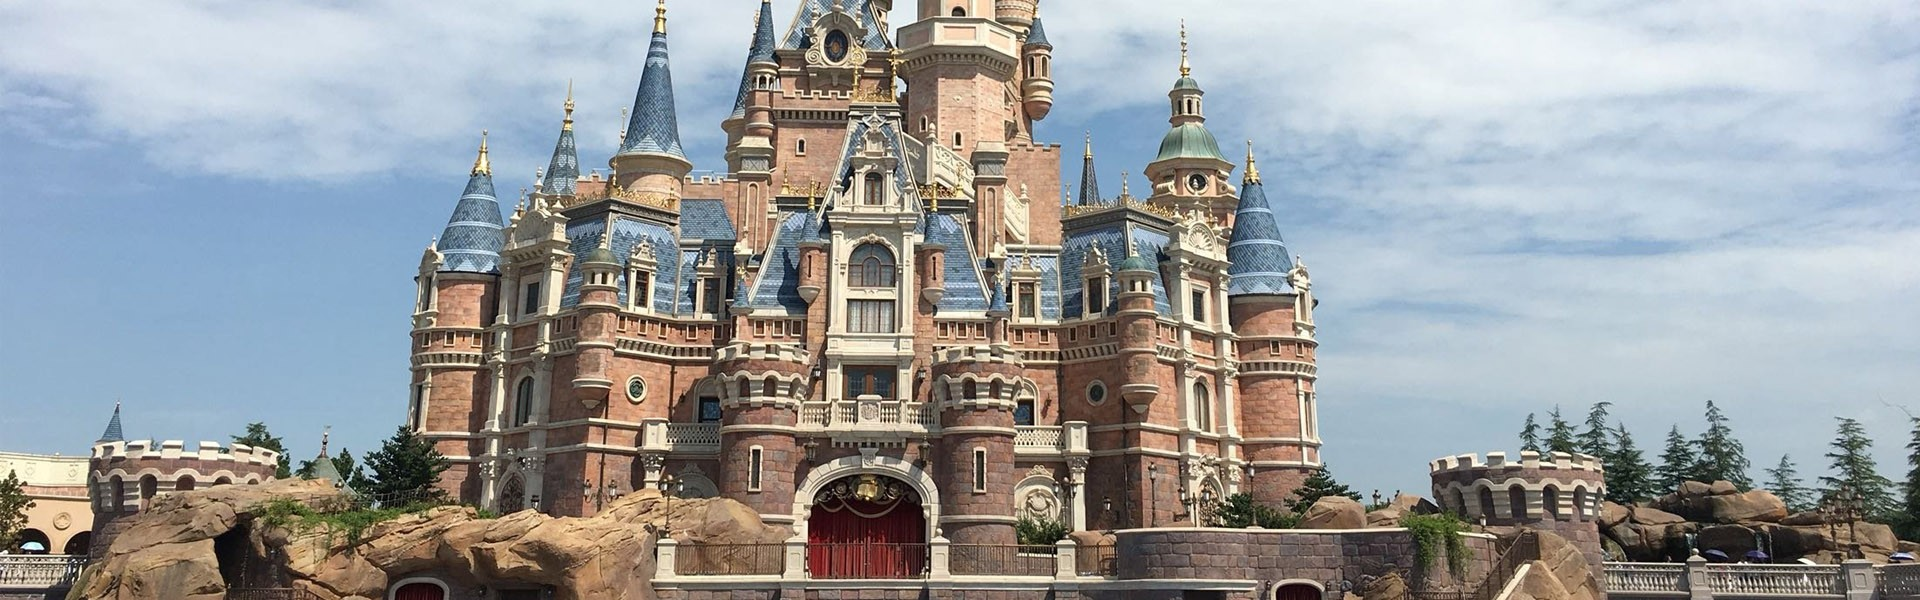 Disneyland'1920x600'1